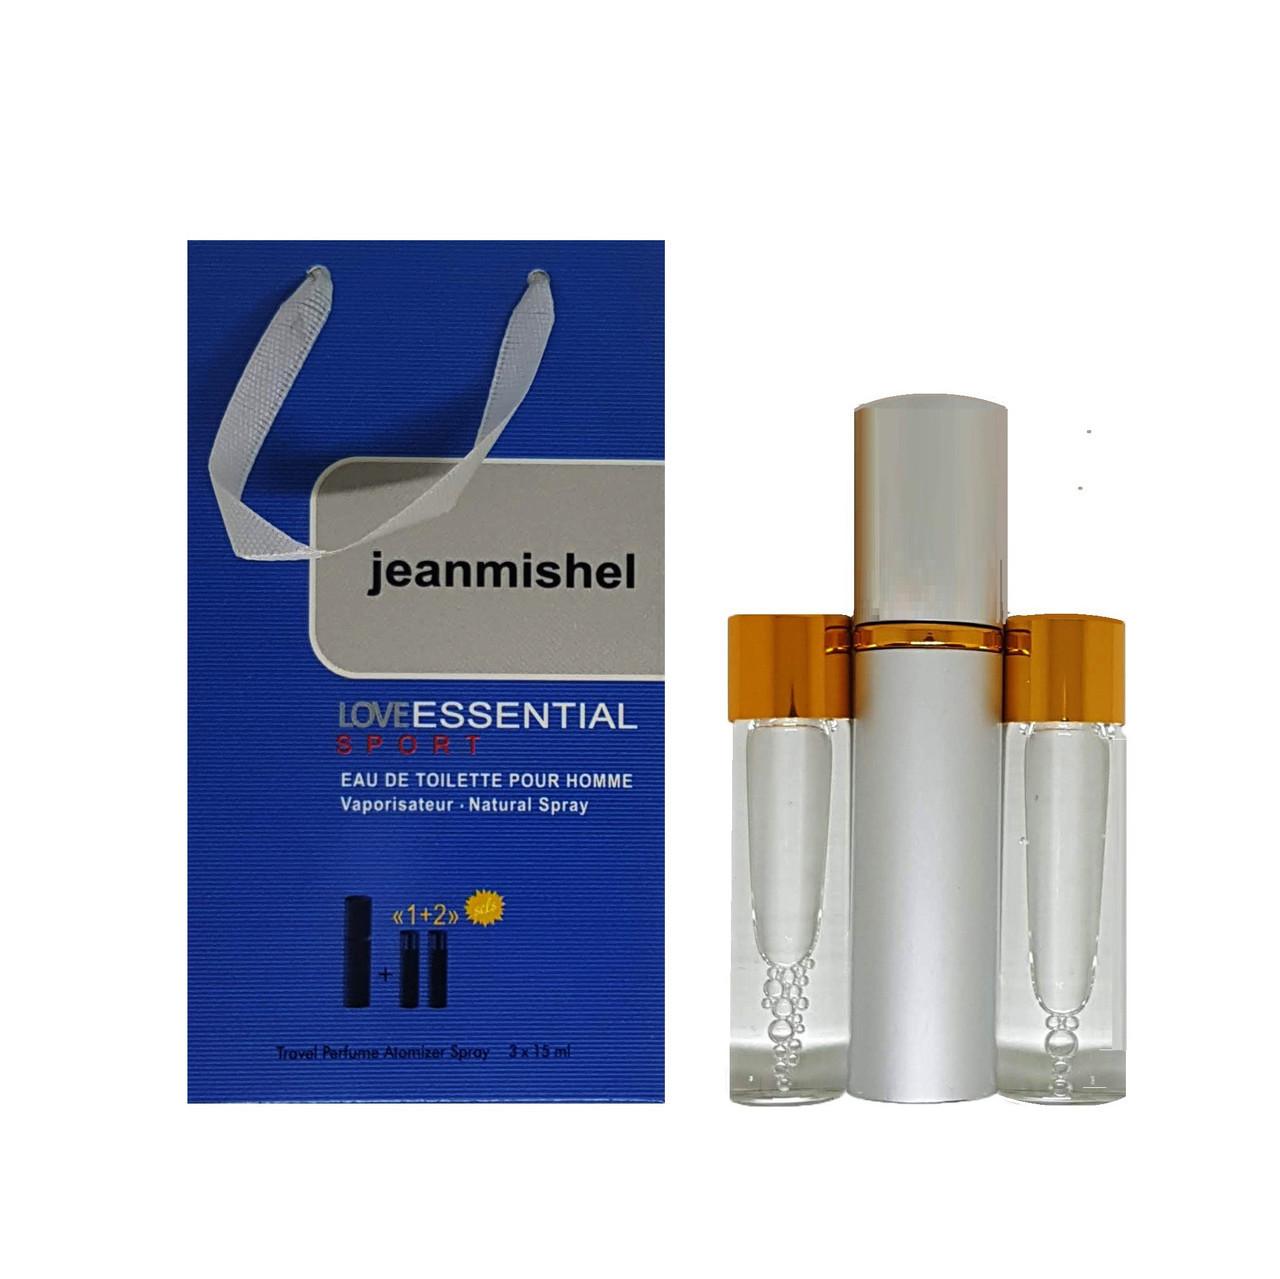 Jeanmishel Love Essential Sport pour homme (55) 3 x 15 ml